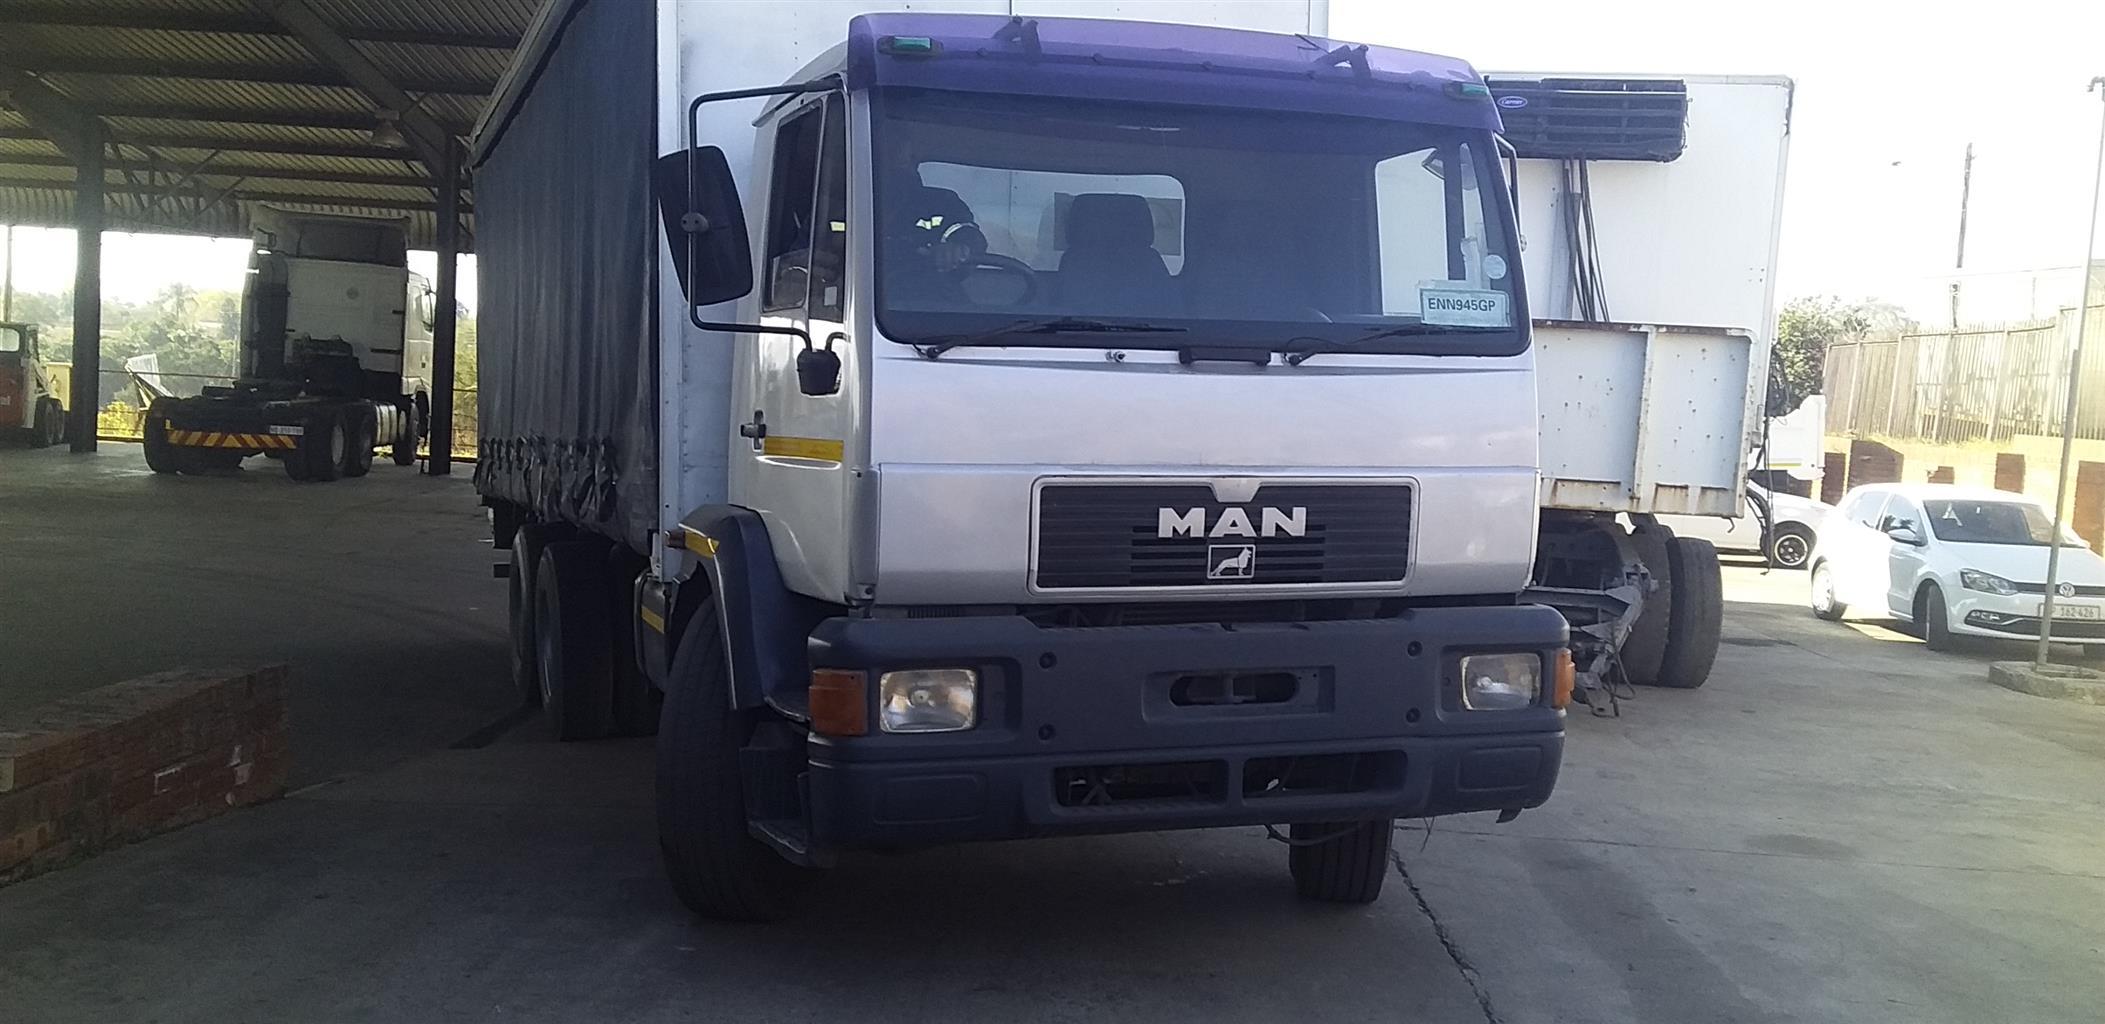 2001 MAN LM200 TAUTLINER BODY